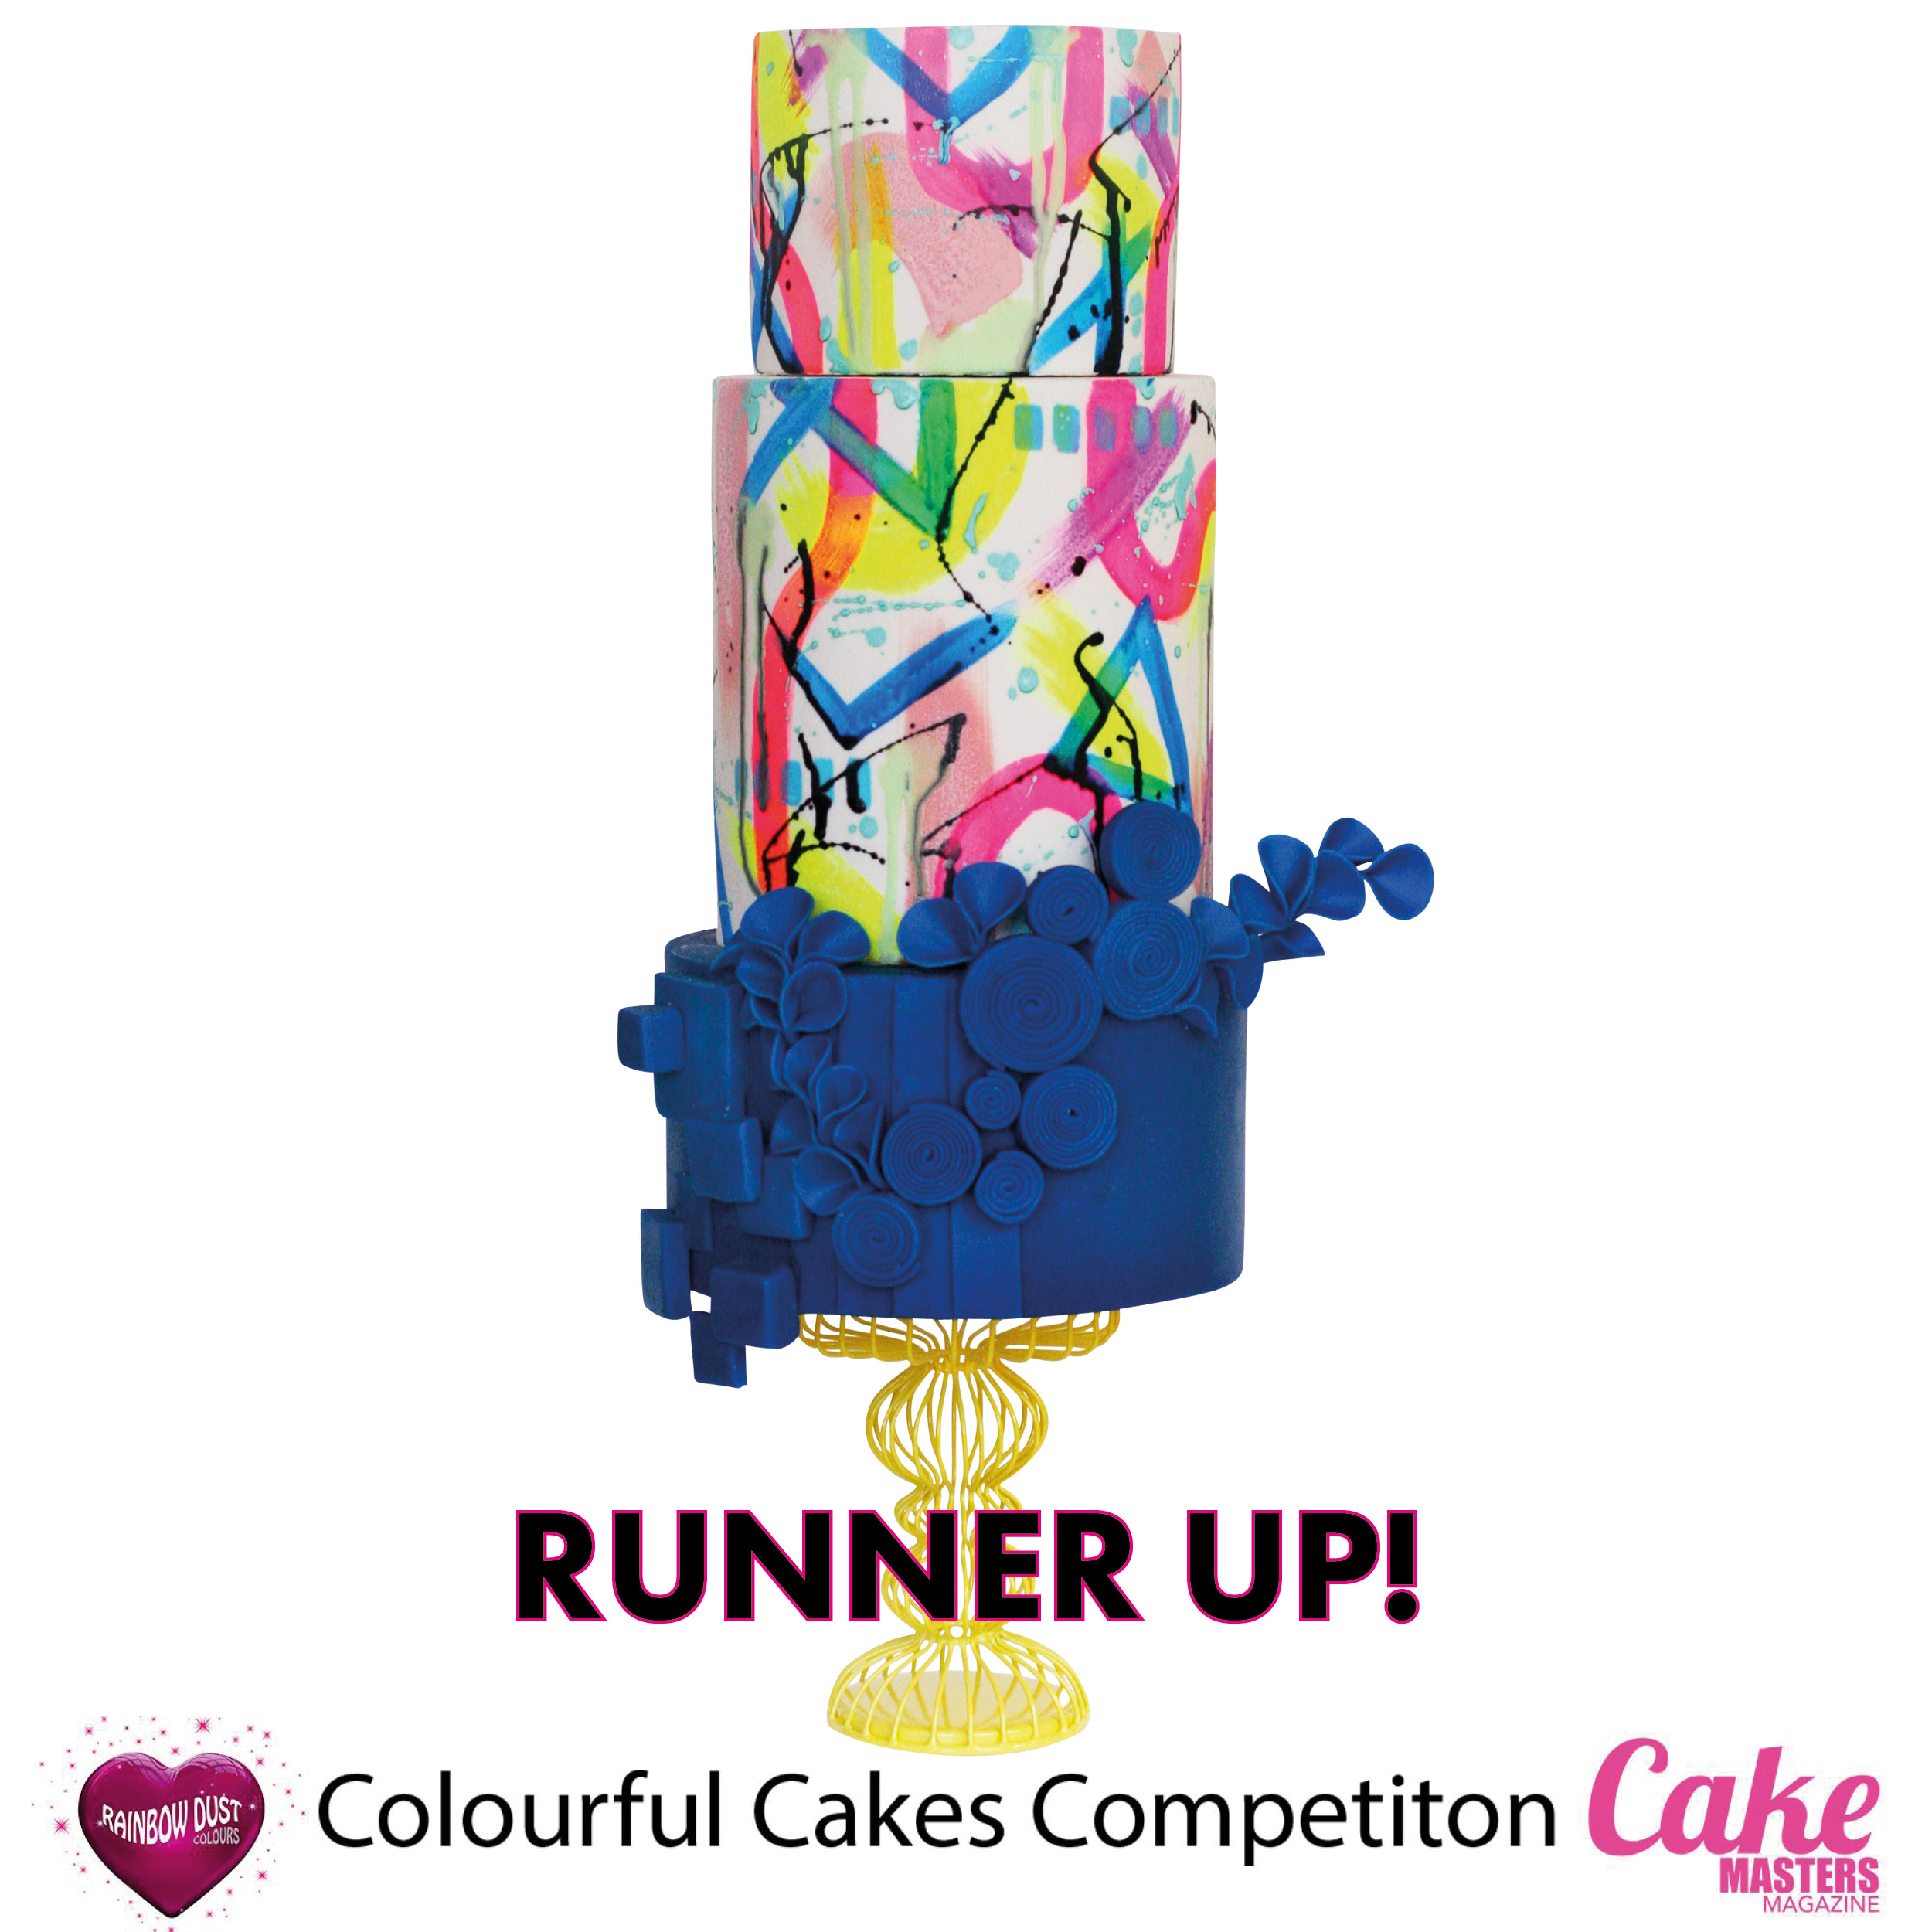 Colourful Cakes Comp FB - Runner Up Amanda Lee, Sugar Sugar Cakes